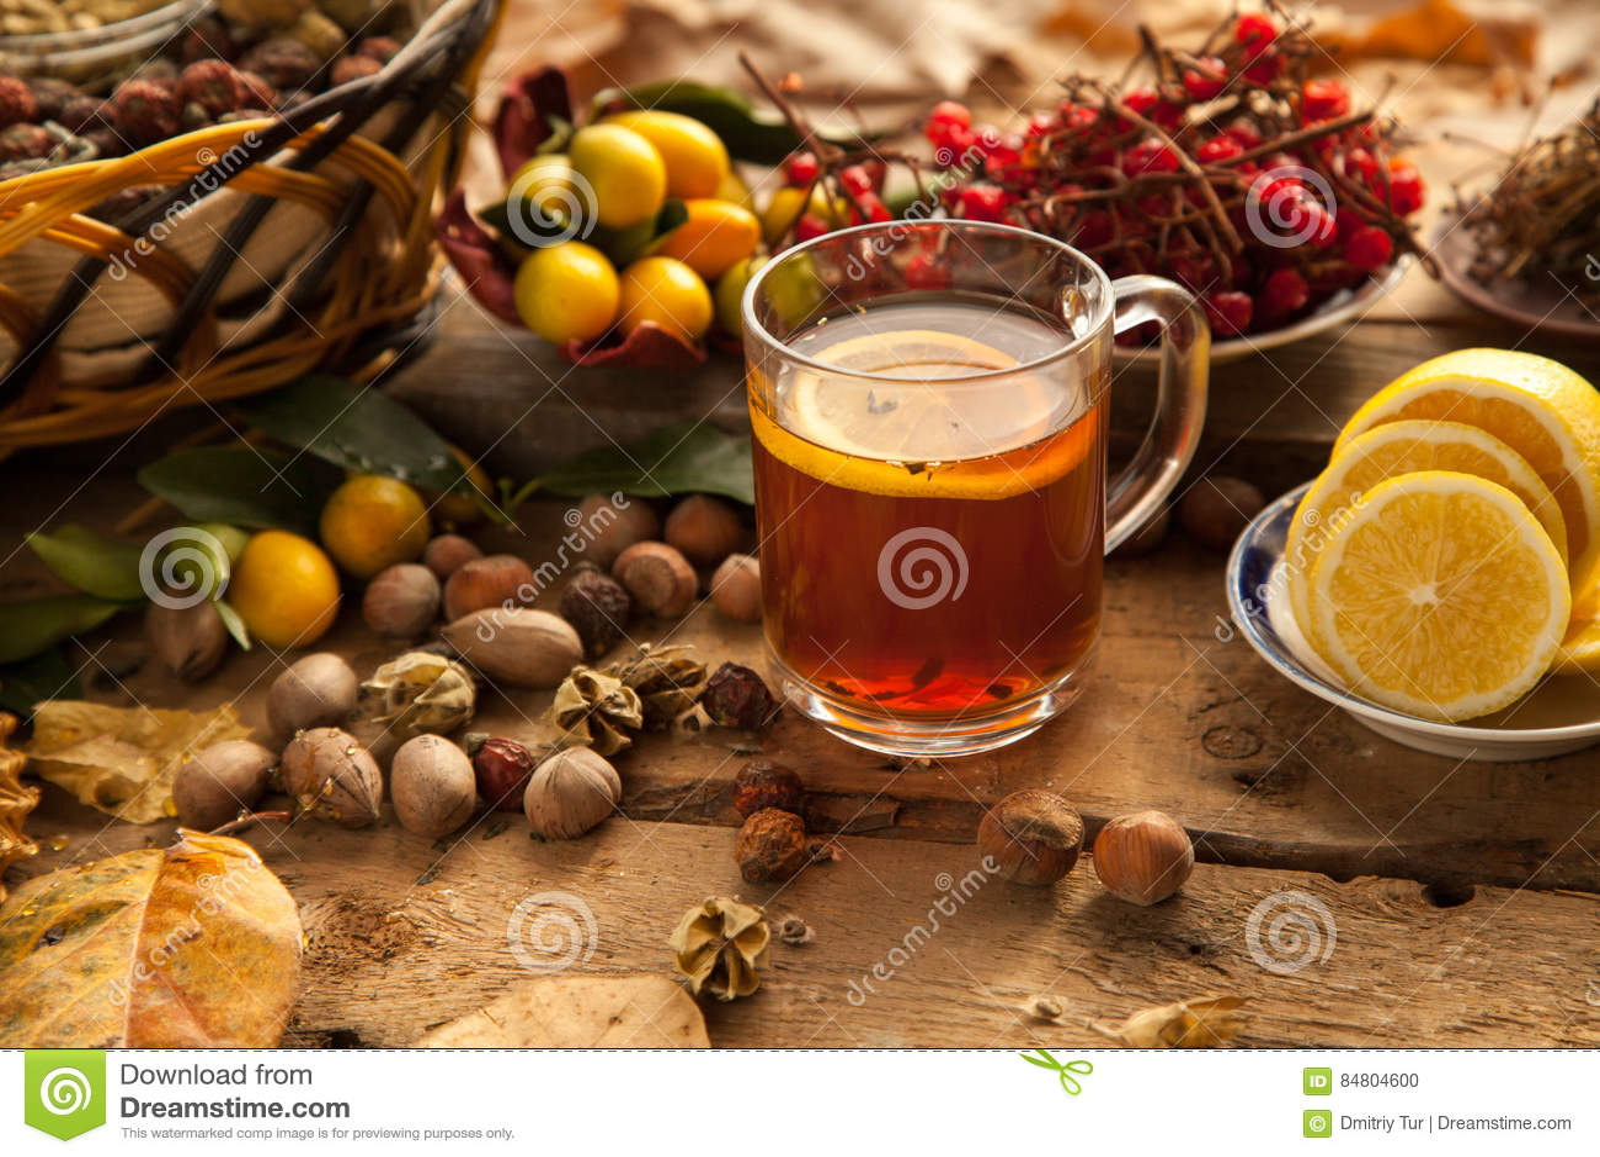 Hot tea with lemon and honey.